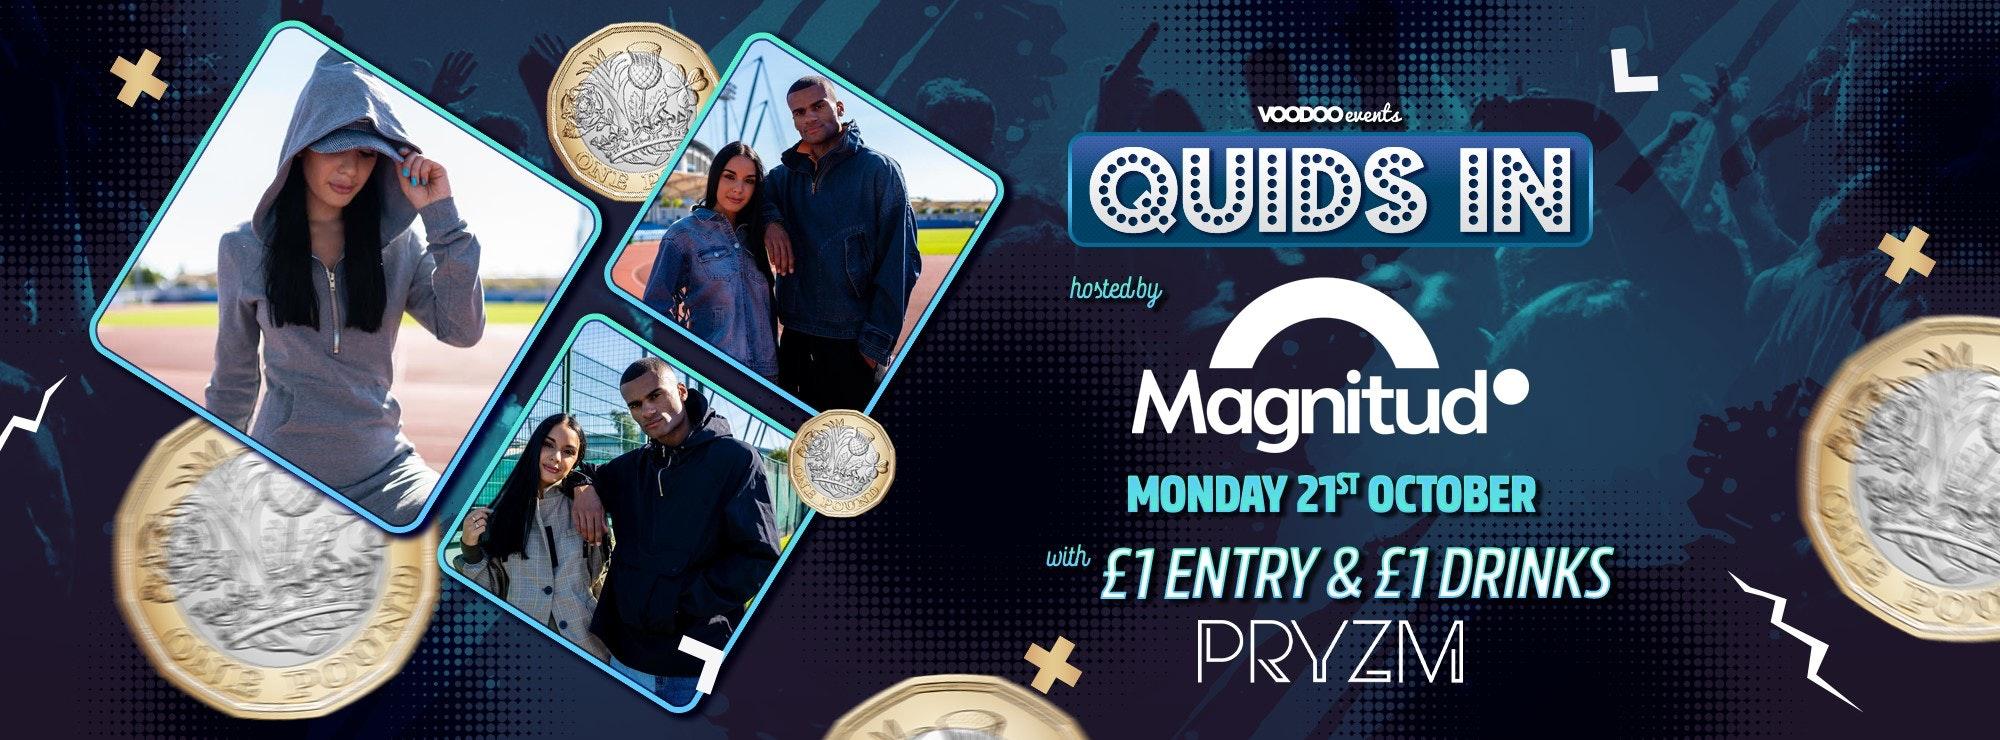 Quids In Mondays Magnitudo Giveaway!